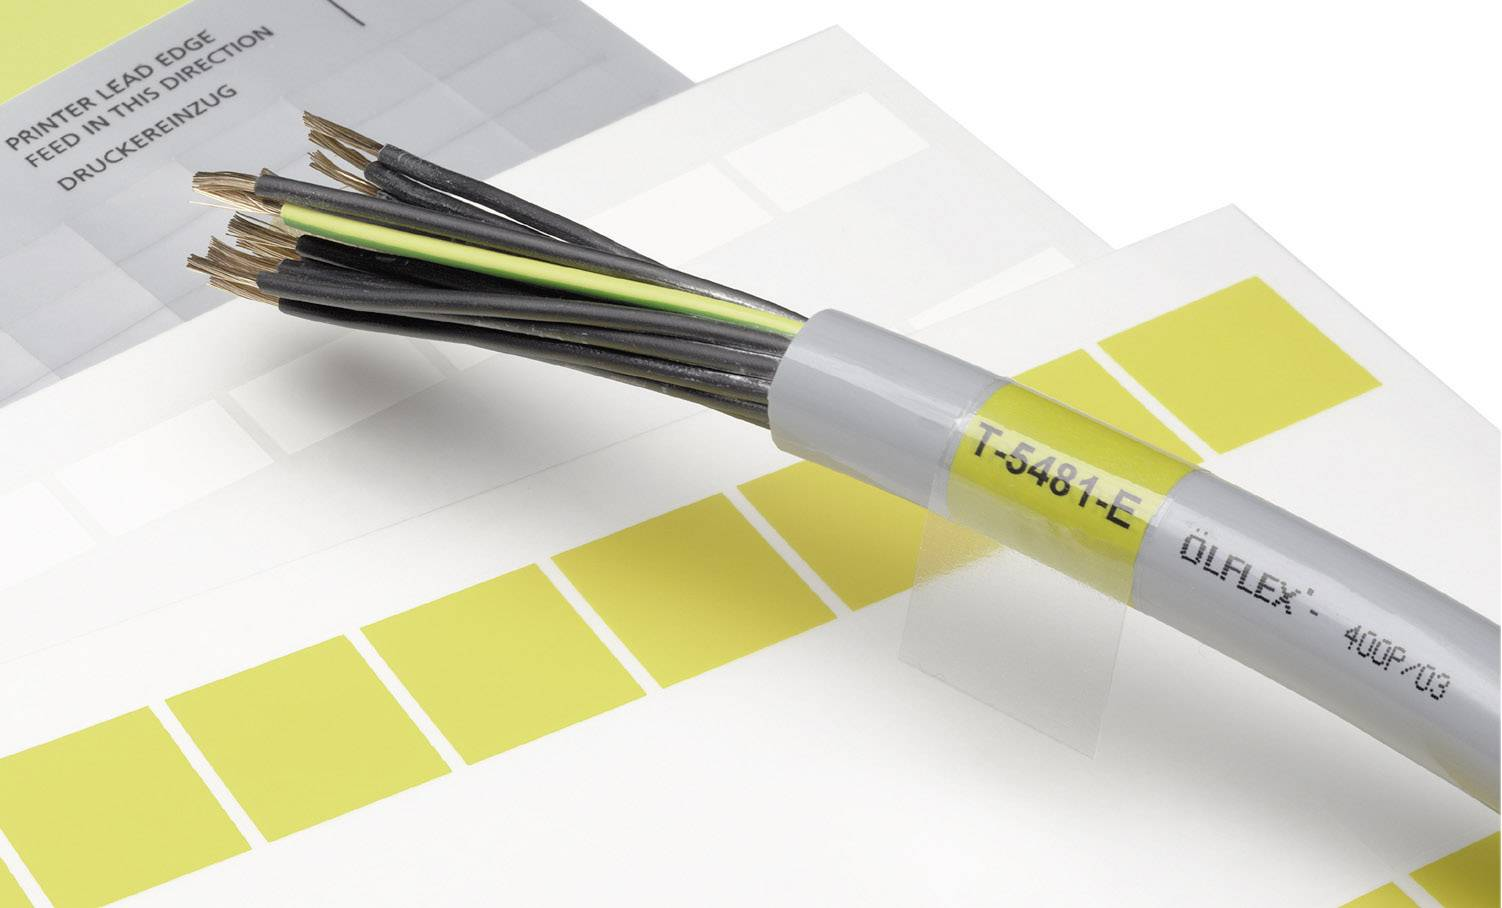 Etikety LappKabel LCK-60 WH (83256151), bílá